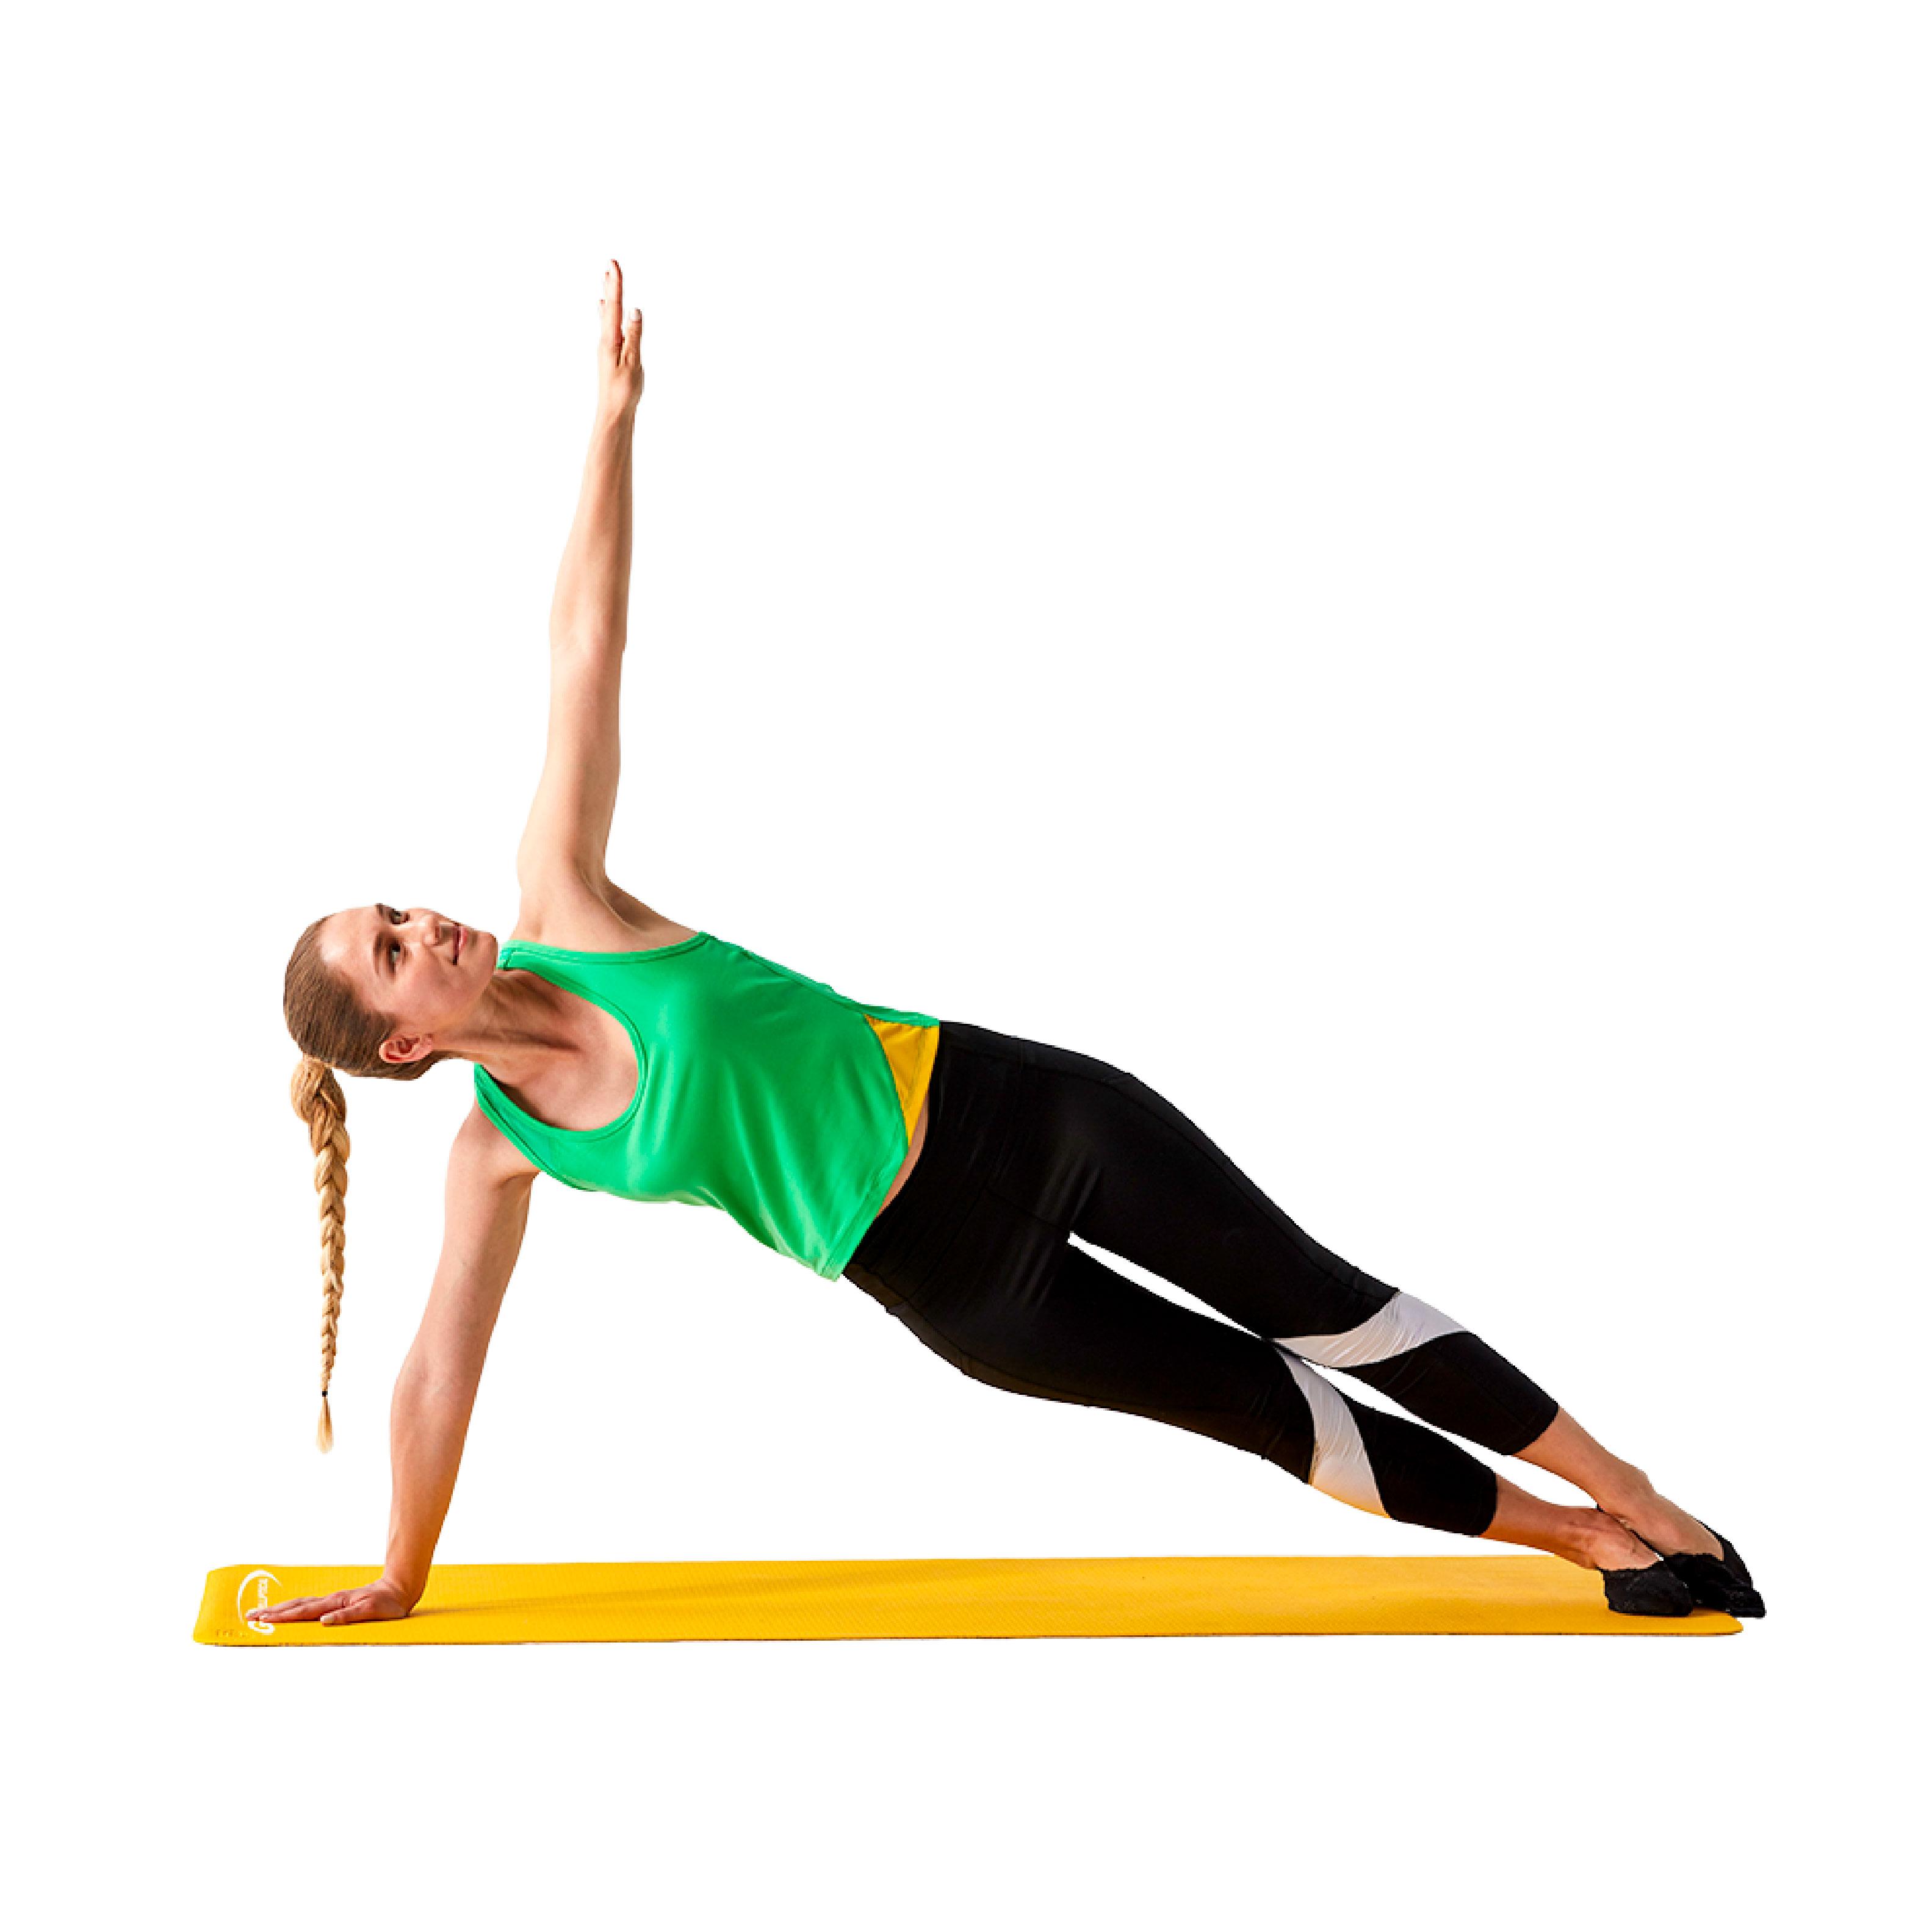 Yogamat05